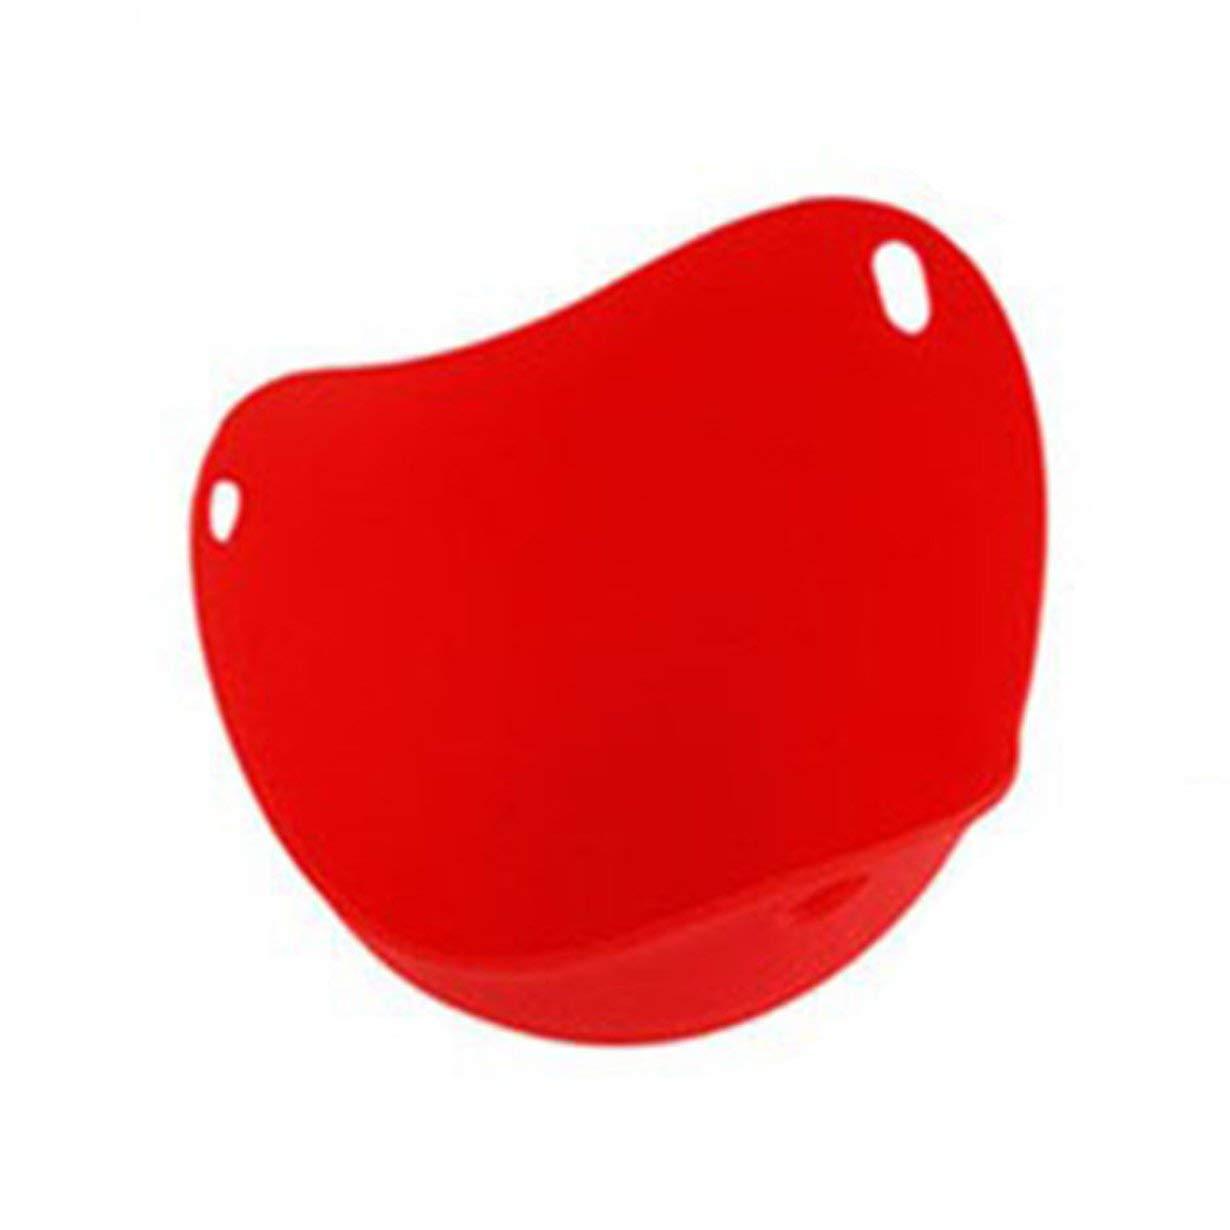 Pochar huevo utensilios de cocina Molde pr/áctico vainas herramienta Copa Cocina Cocinar cazador furtivo de silicona para hornear cocinar huevos escalfados rojo